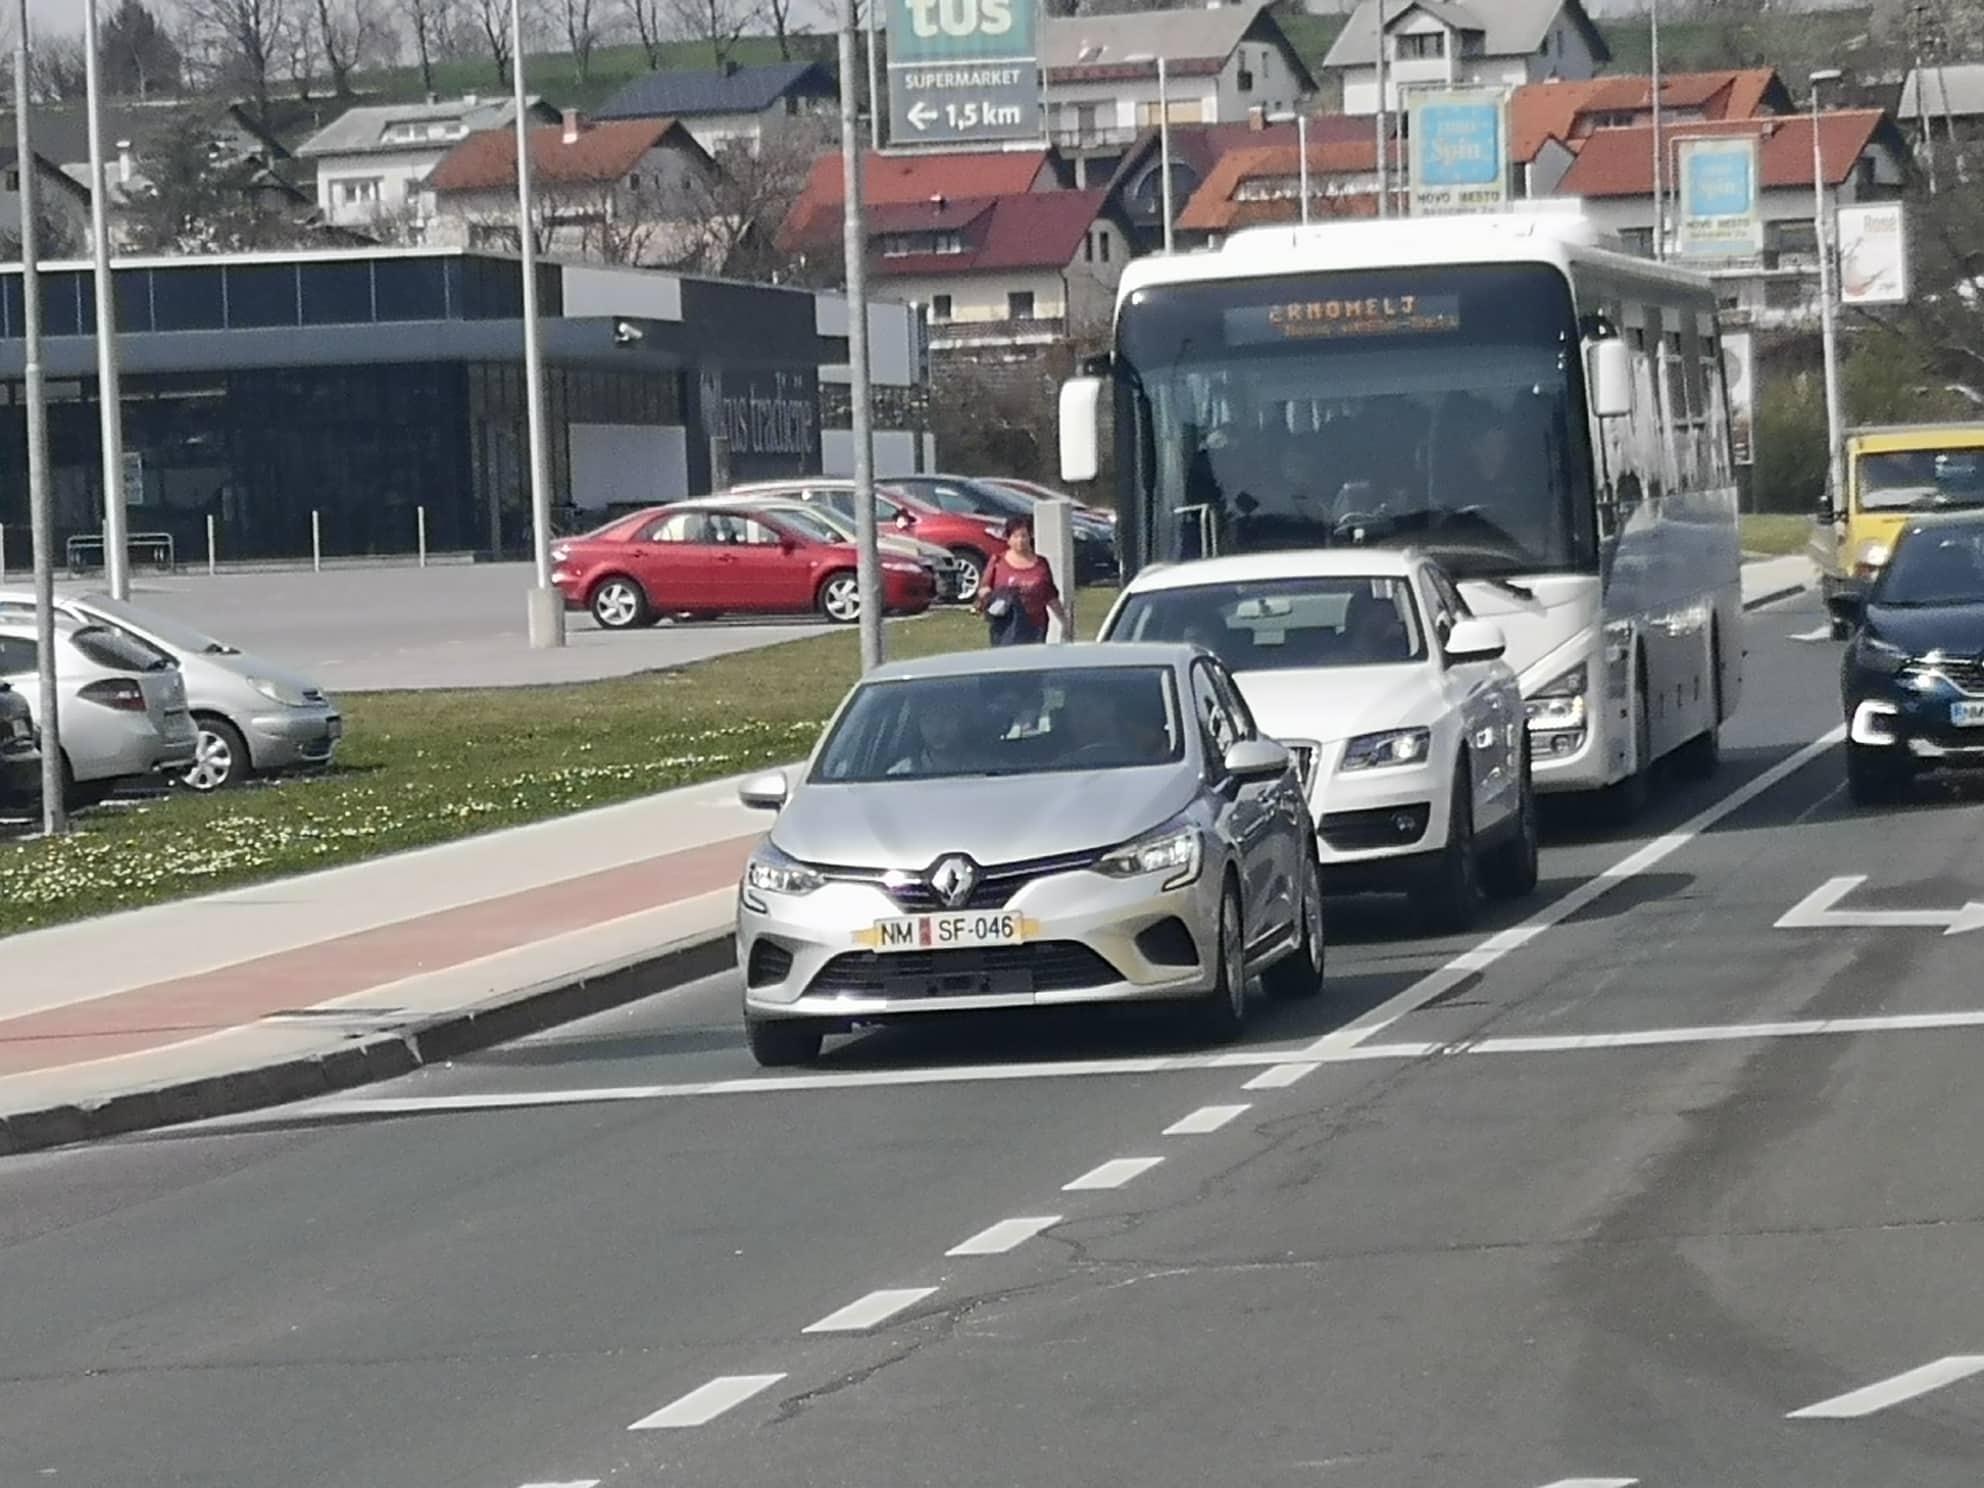 2019 - [Renault] Clio V (BJA) - Page 36 Cliovnm